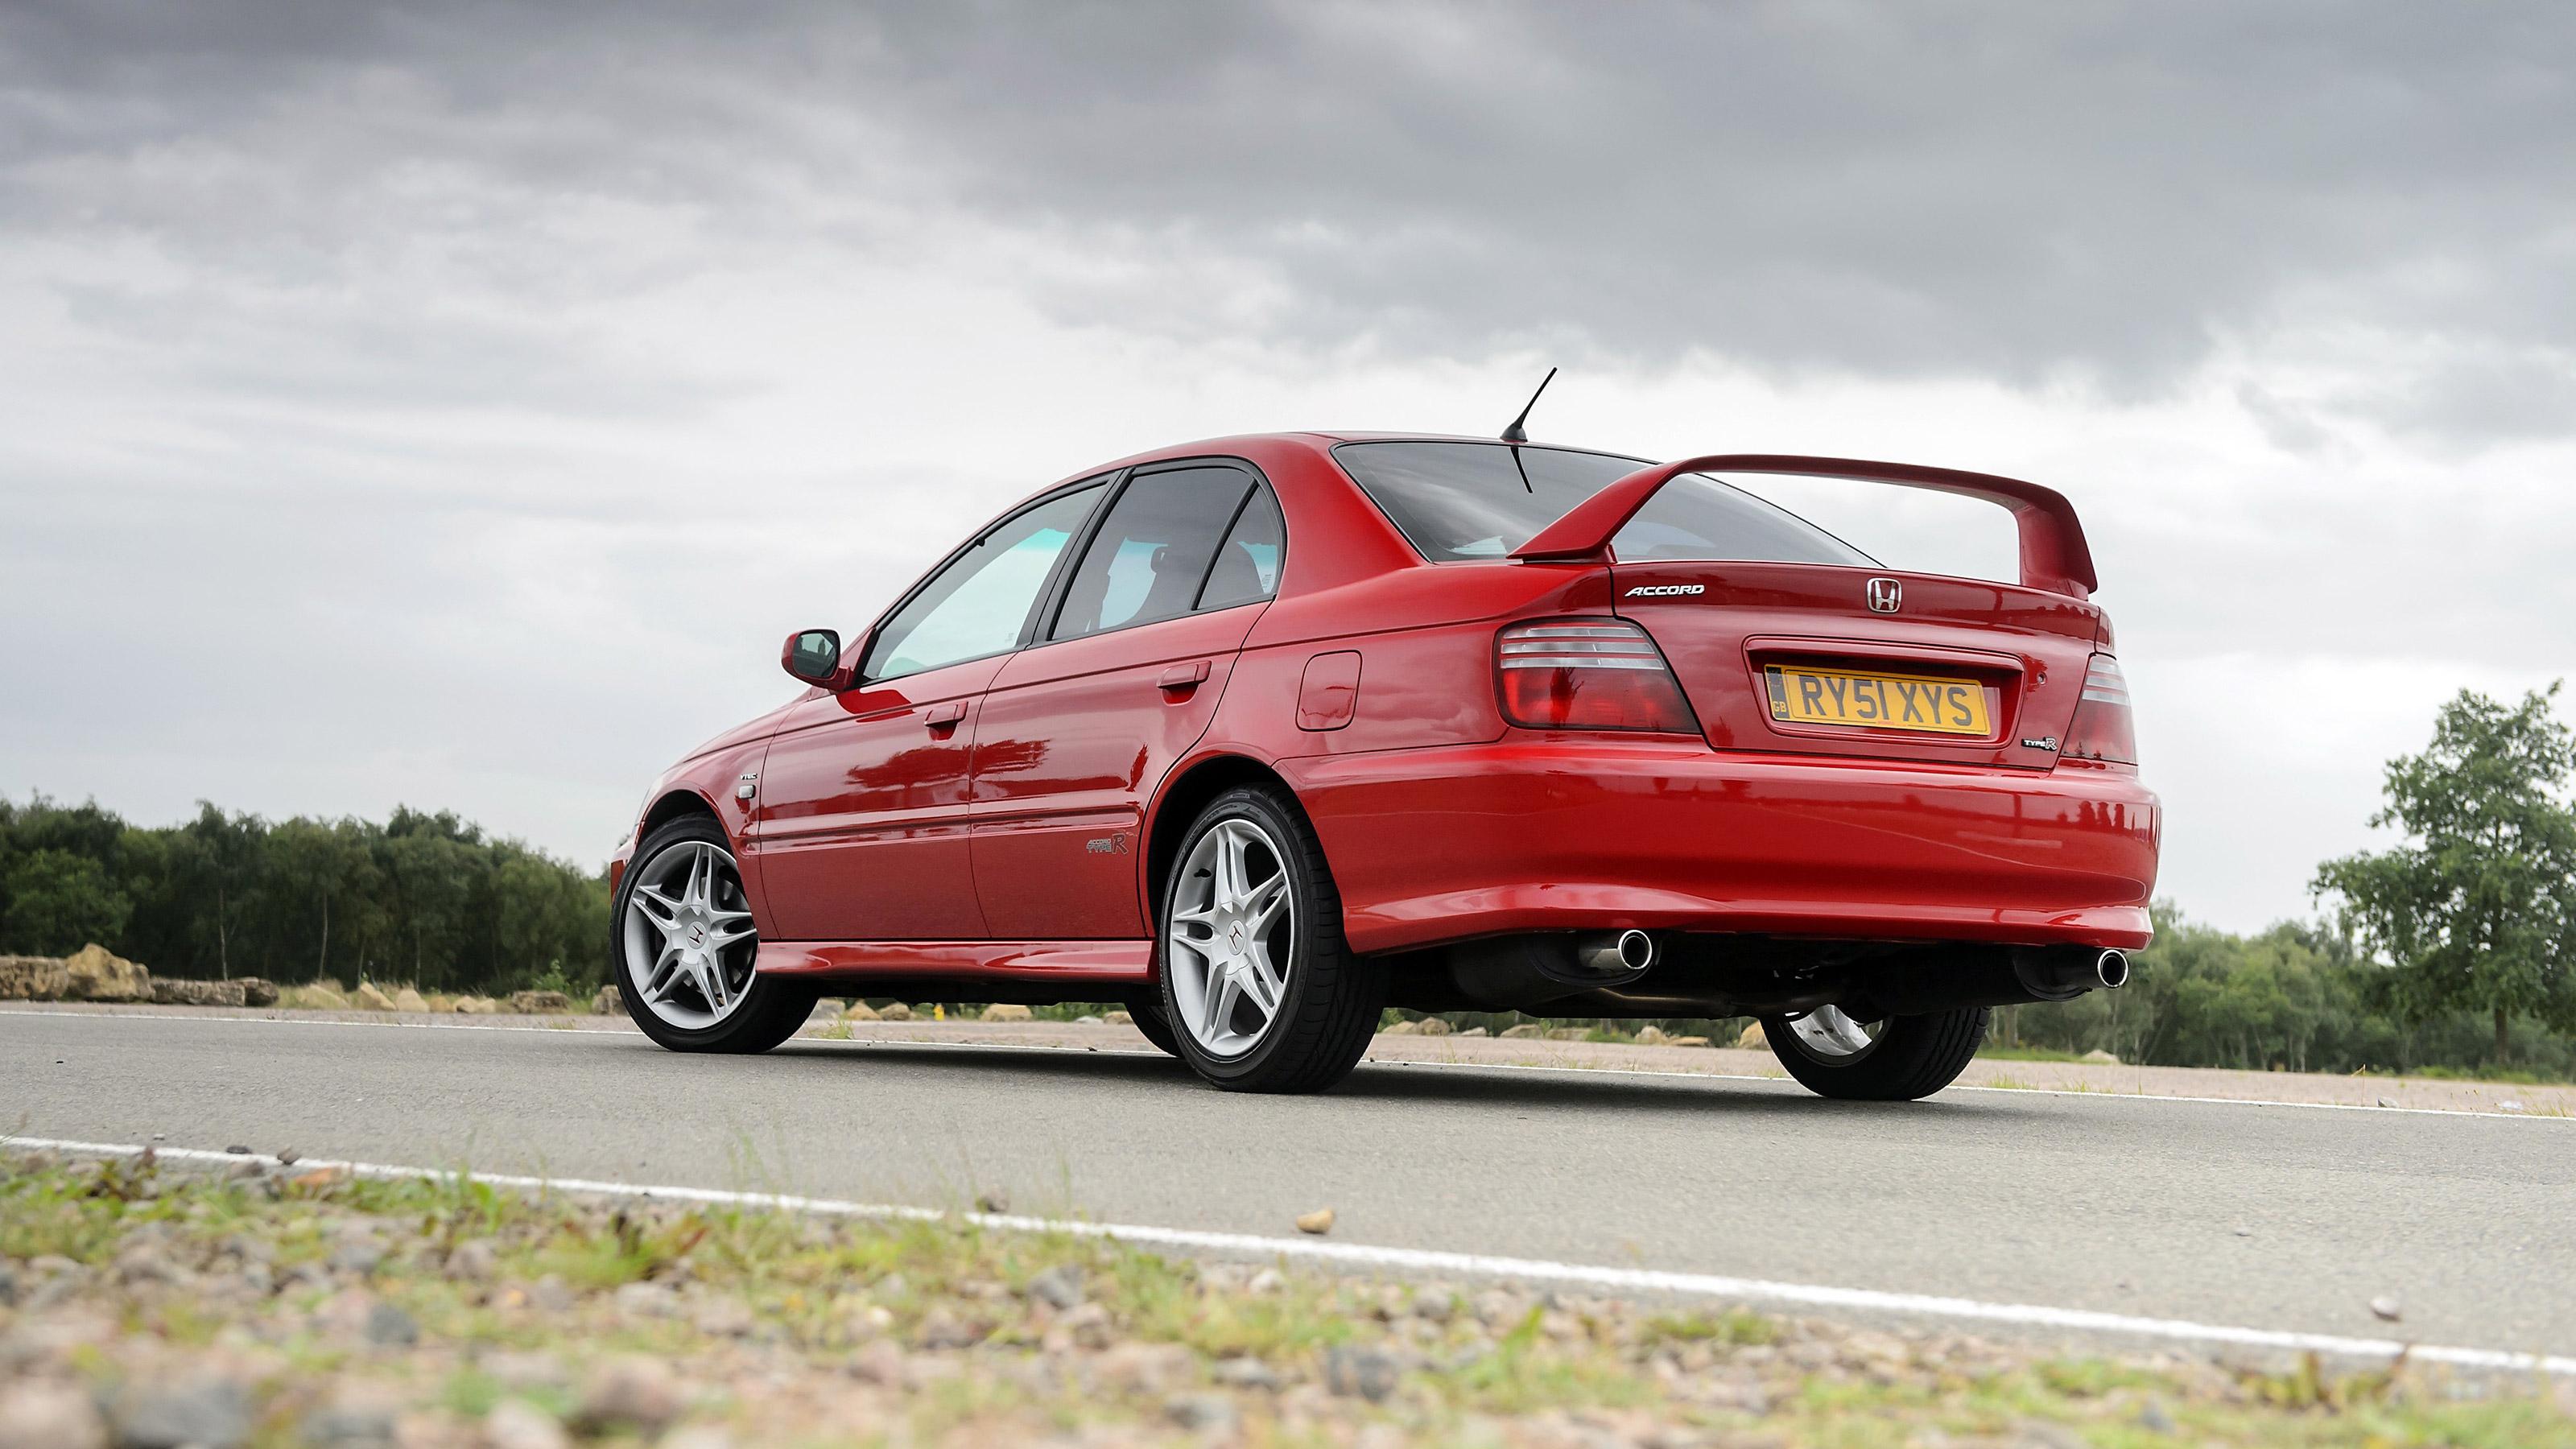 Kelebihan Kekurangan Accord Type R Murah Berkualitas